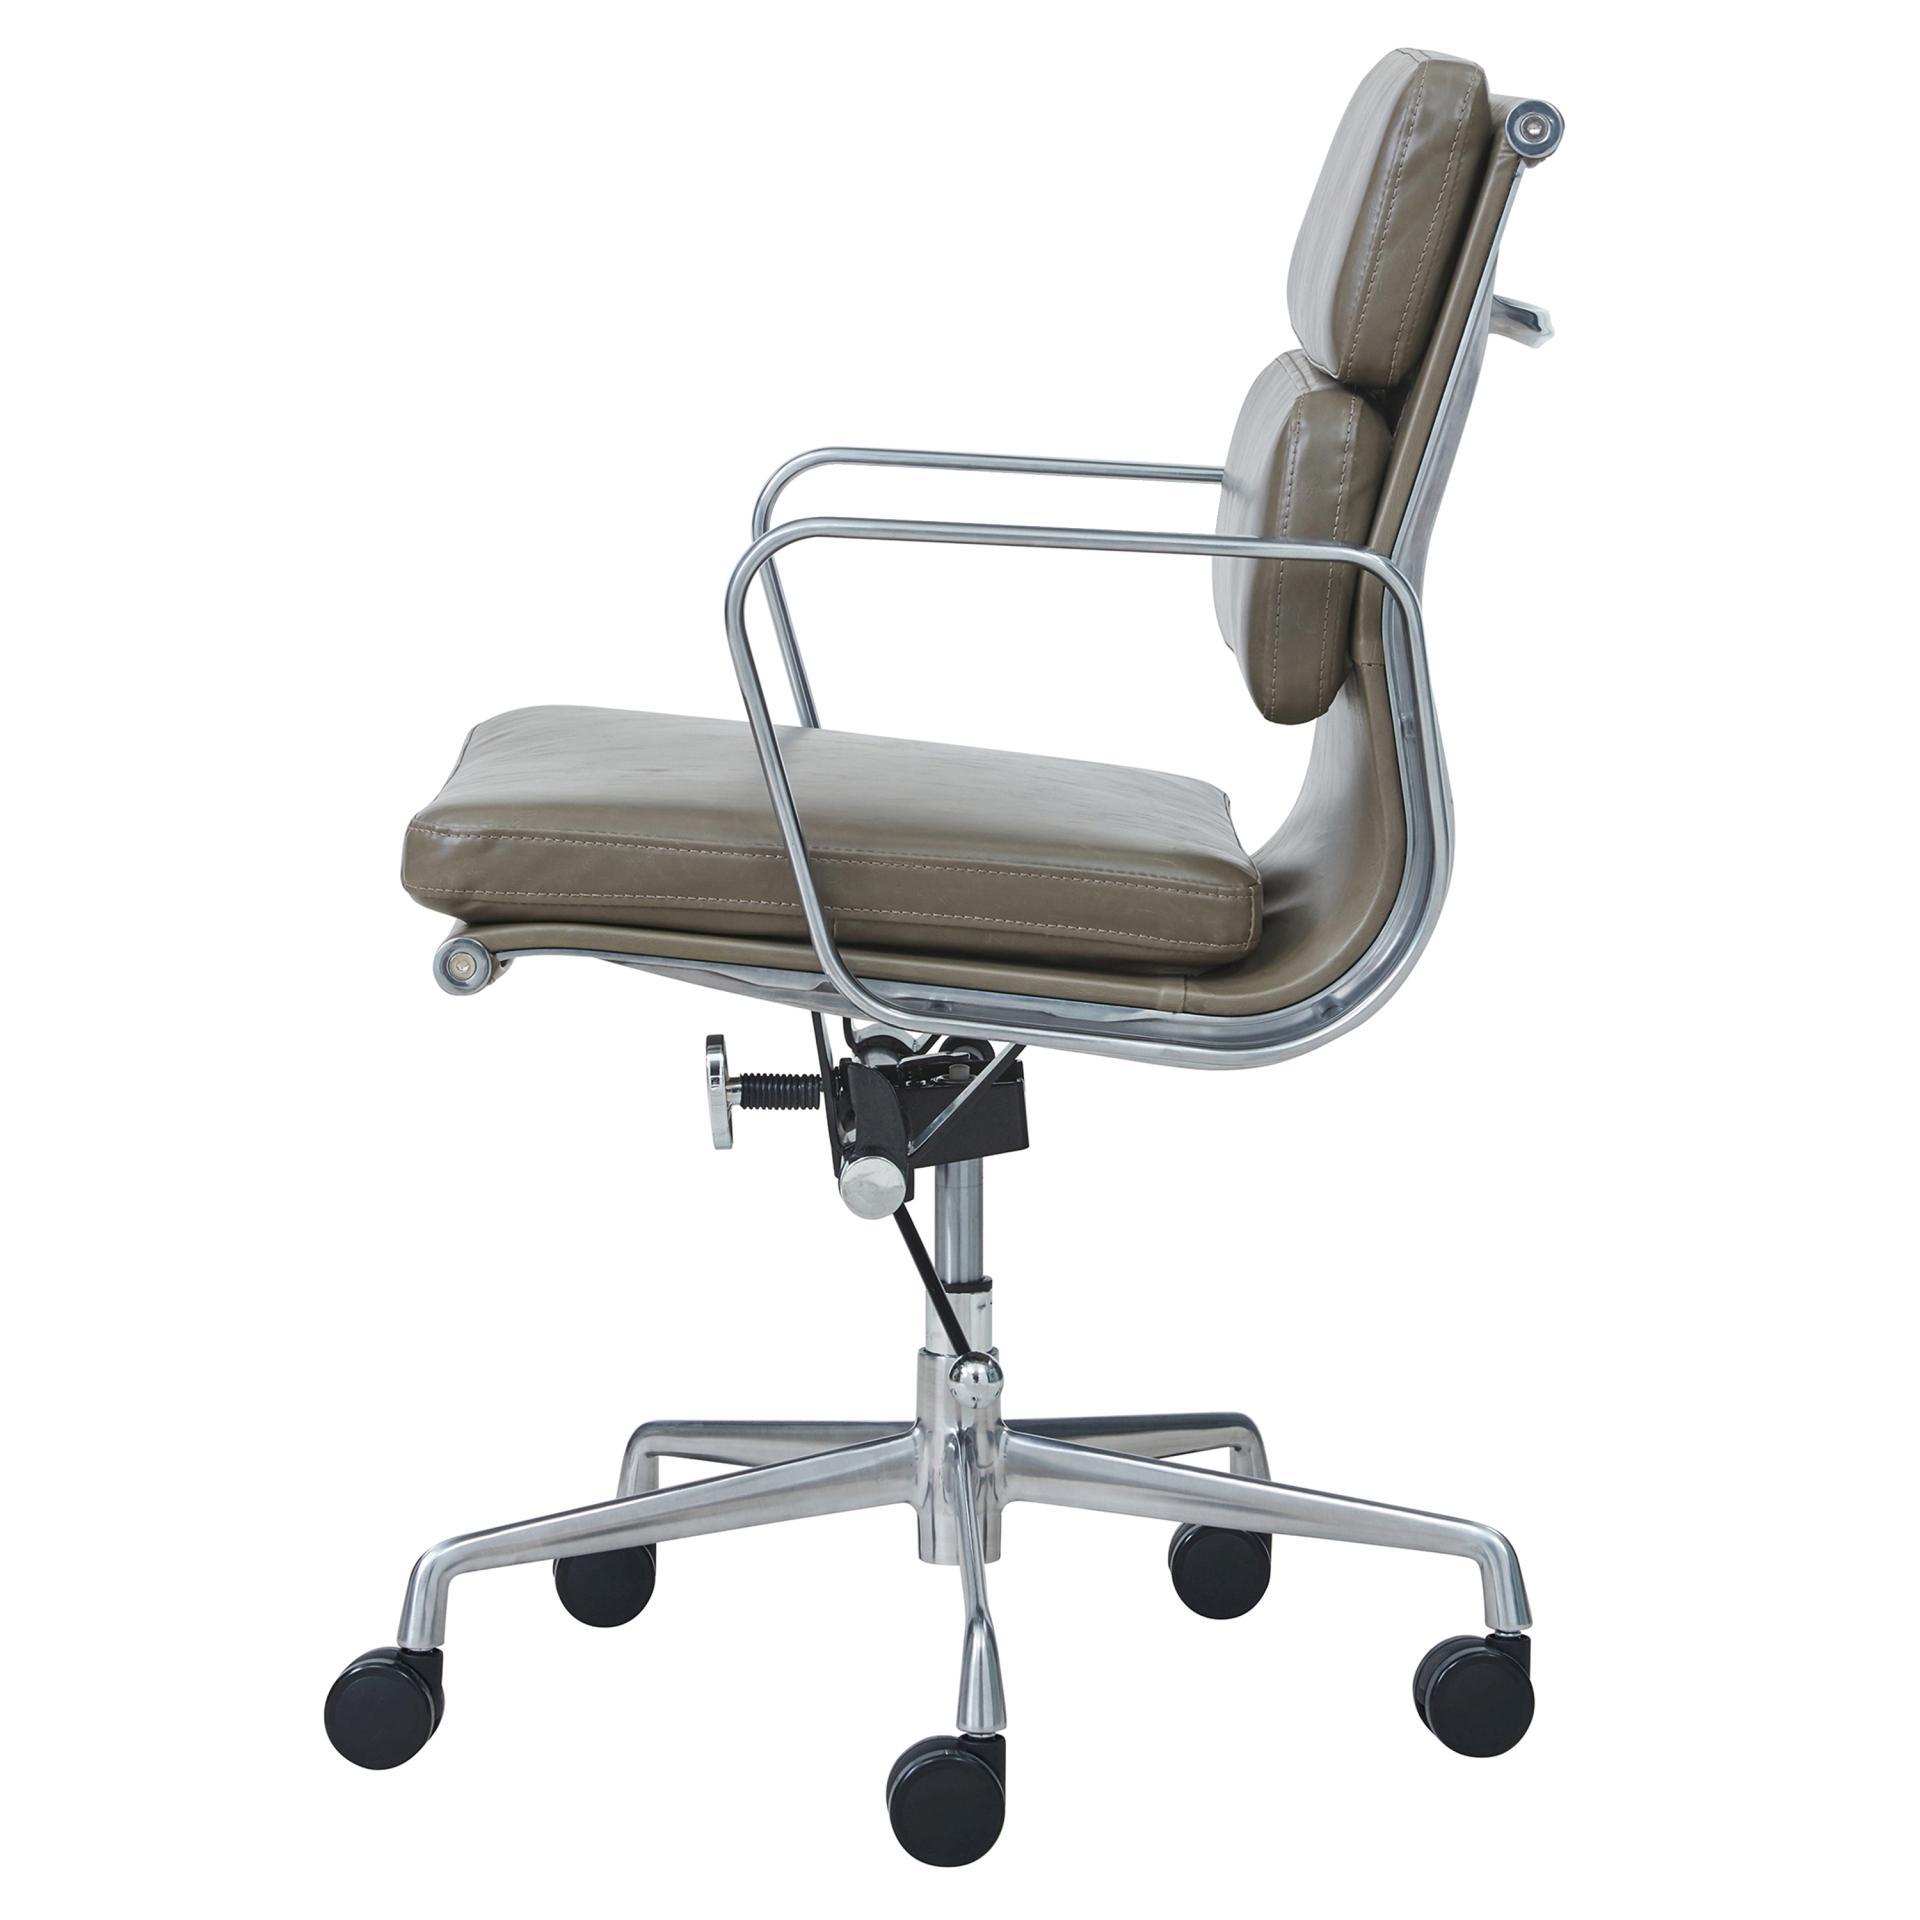 6900002 Vs Npd Home Furniture Wholesale Lifestyle